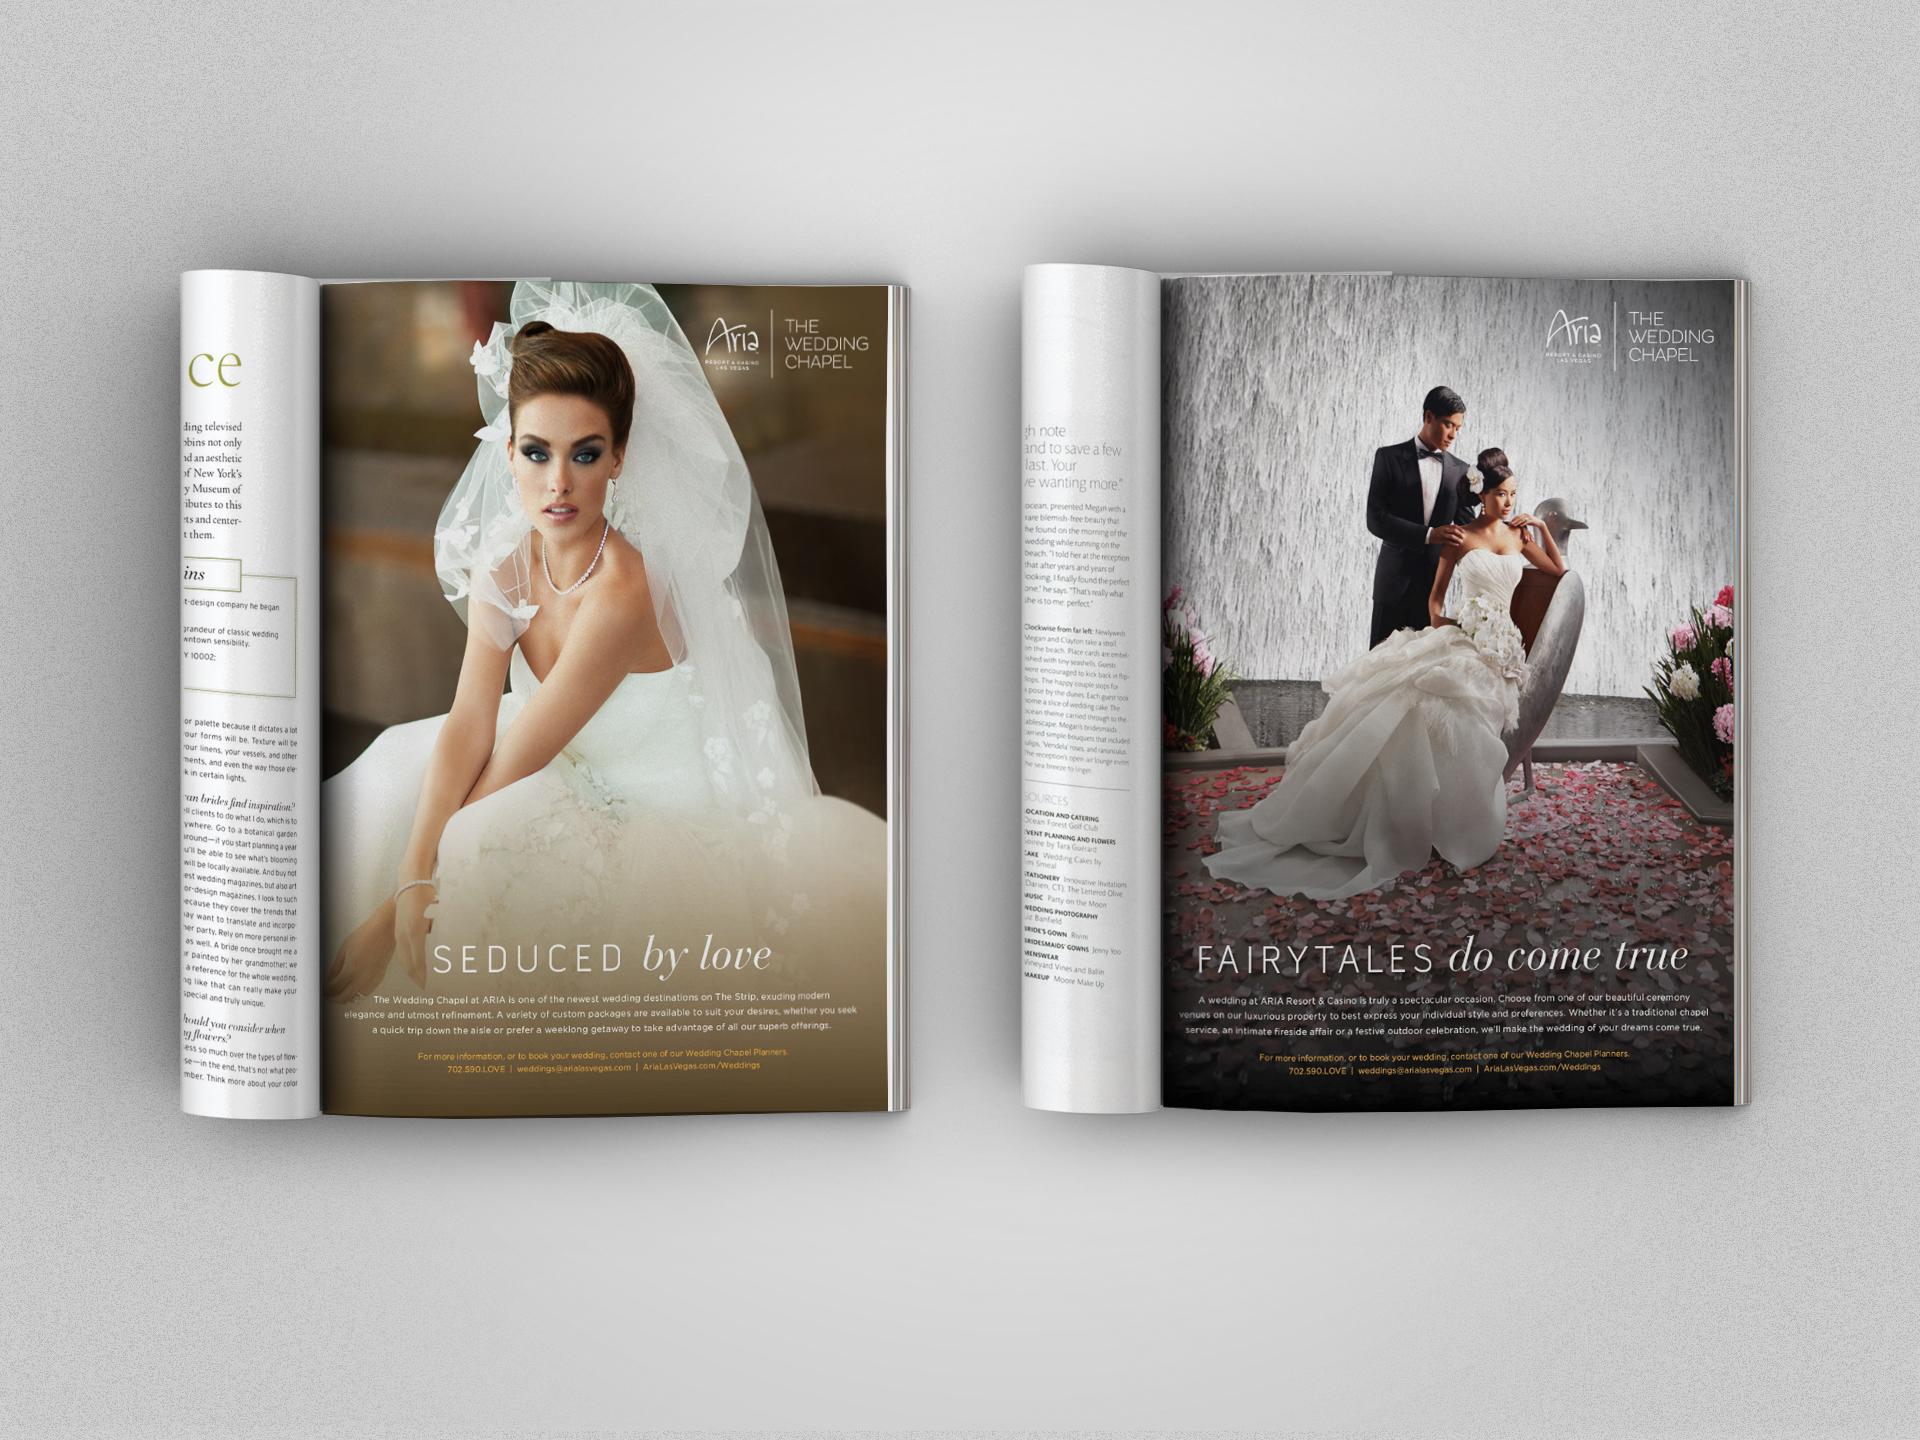 Two wedding ads